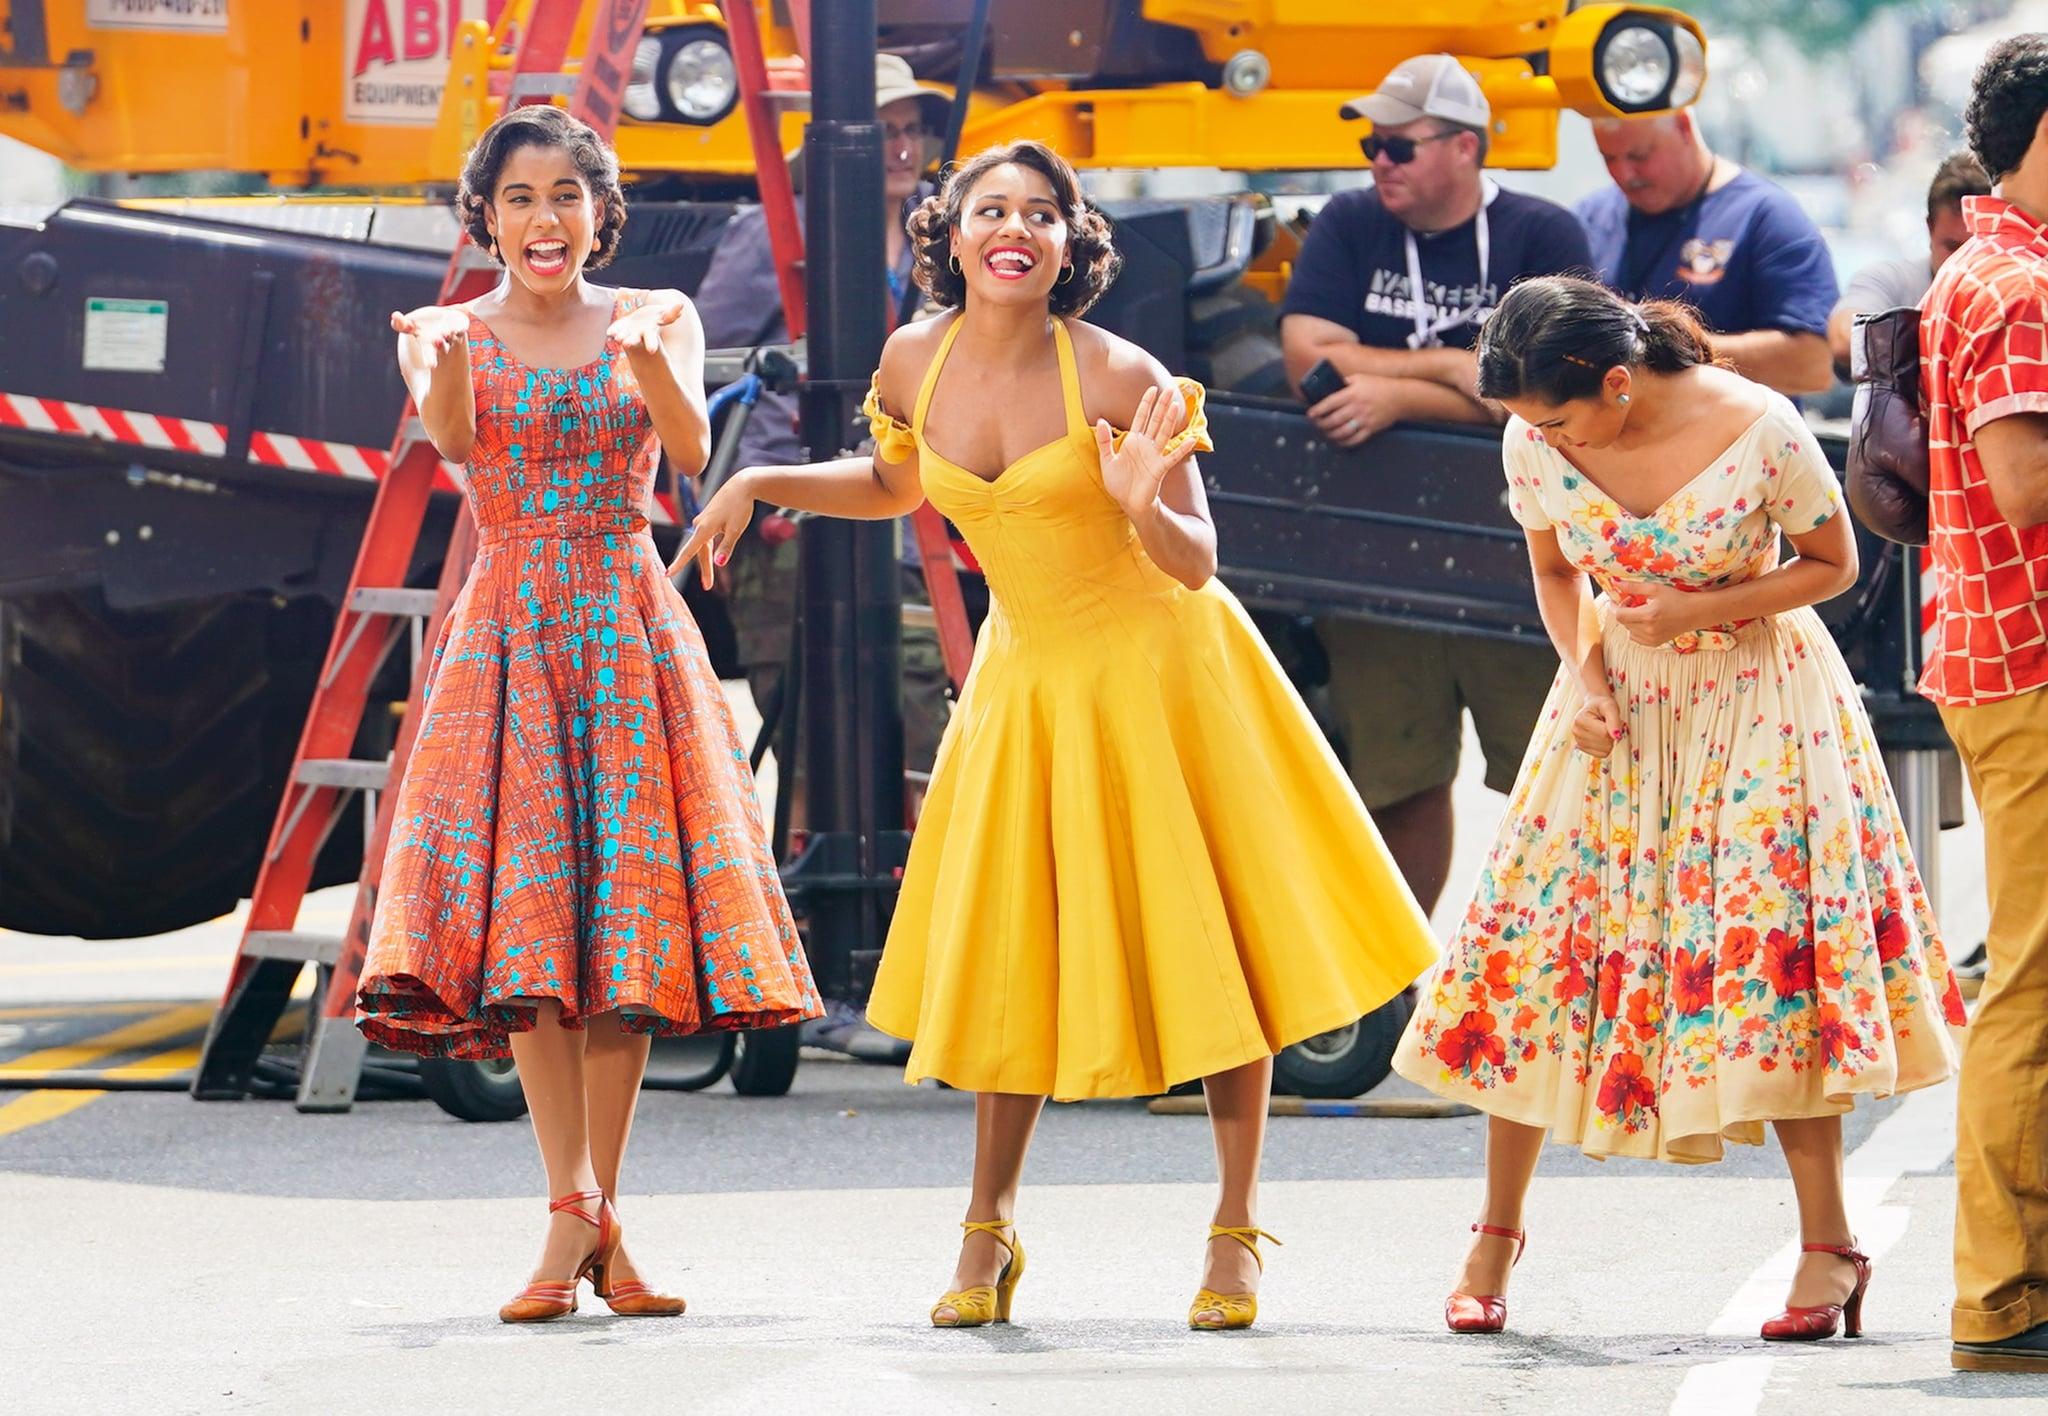 Three women in 1960s dresses